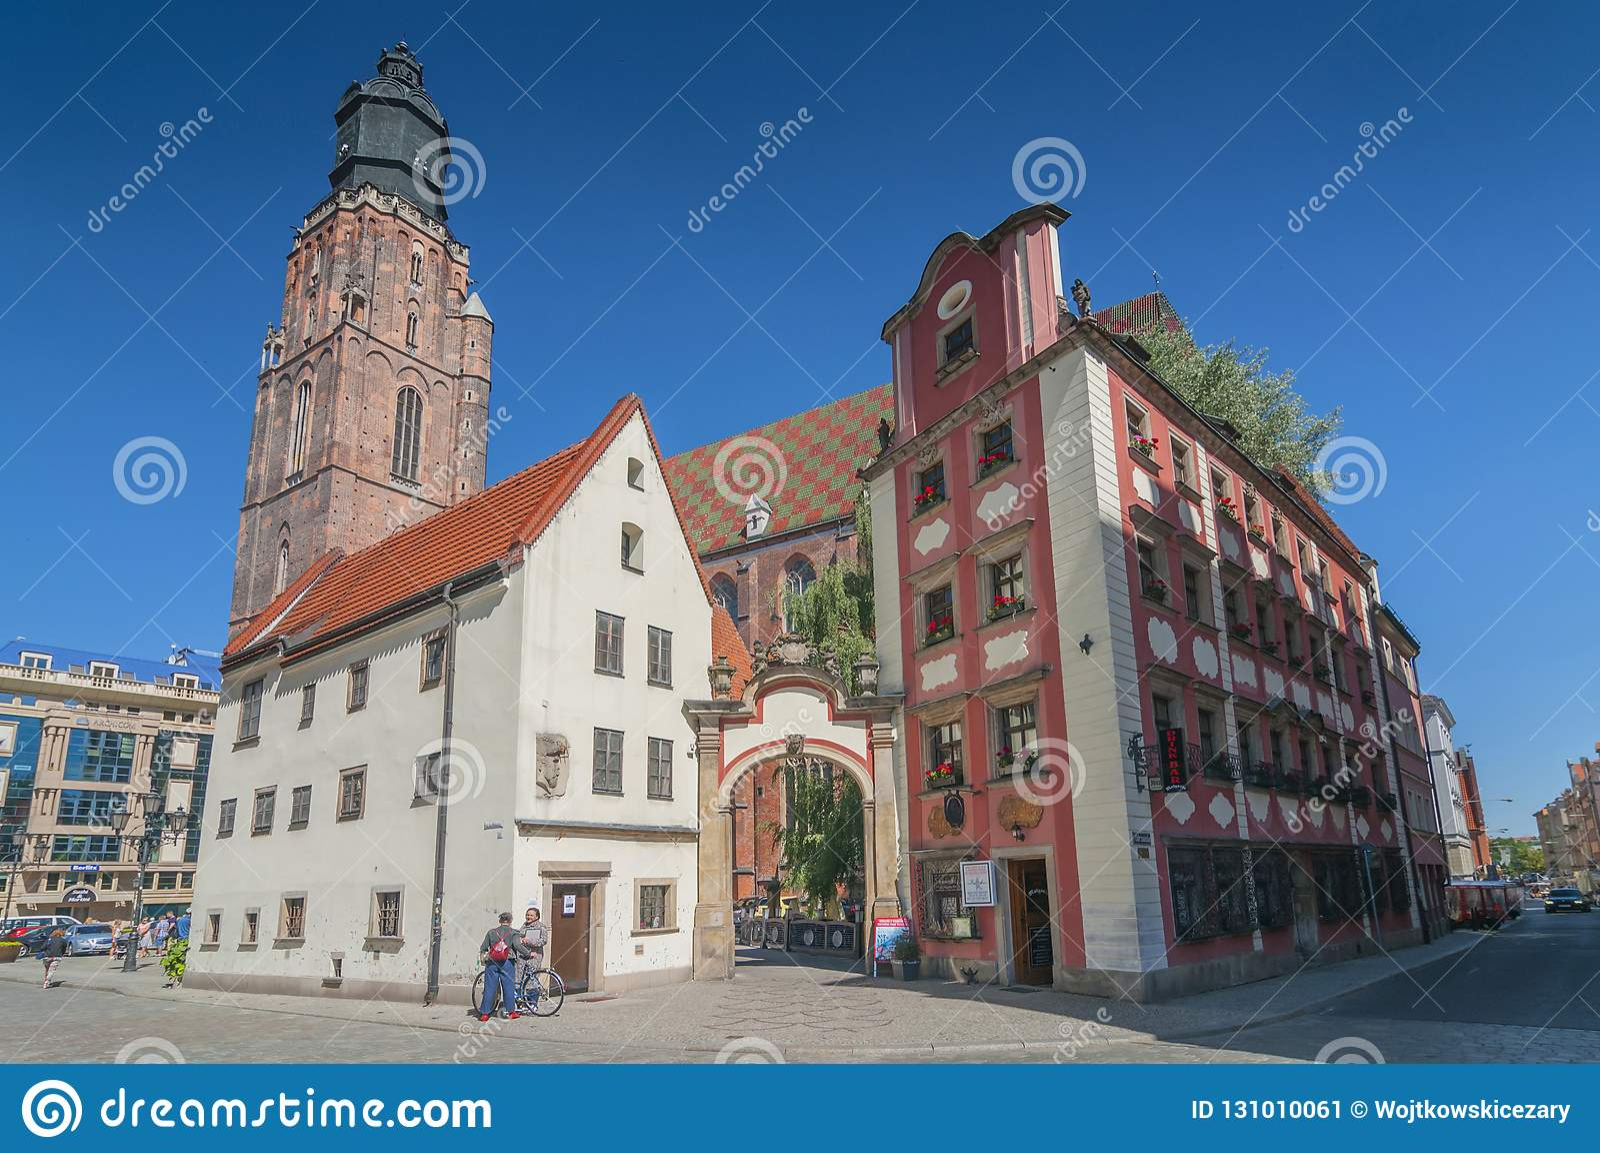 Jas en van Malgosia Johnny en van Mary miniatuurhuizen en St Elizabeth Church in Wroclaw, Silesië, Polen